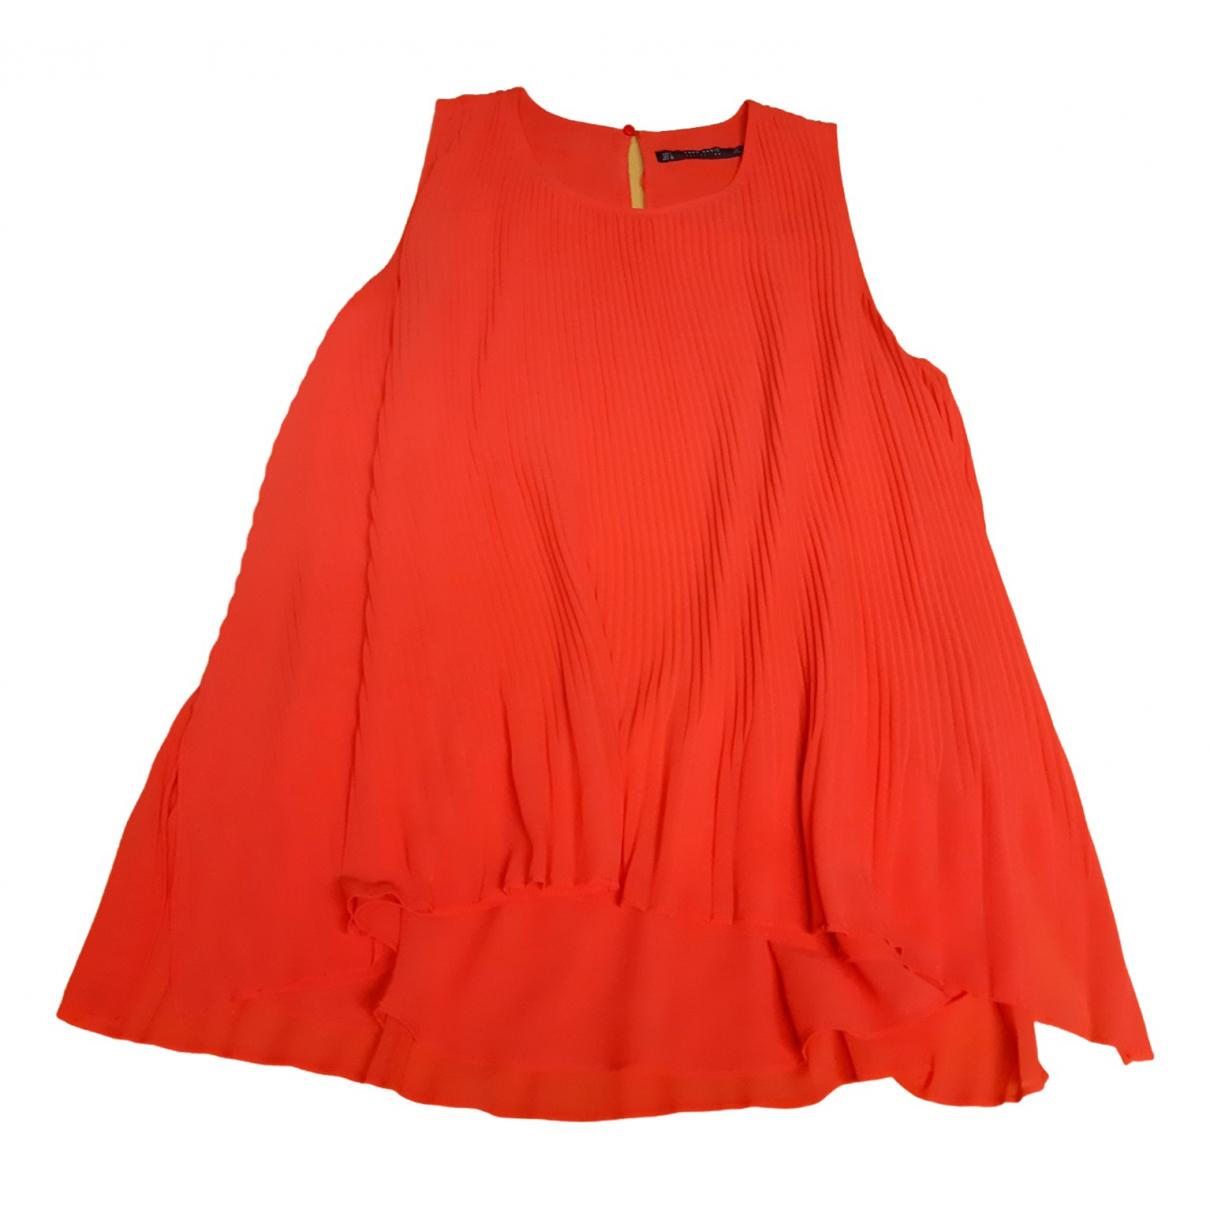 Zara - Top   pour femme